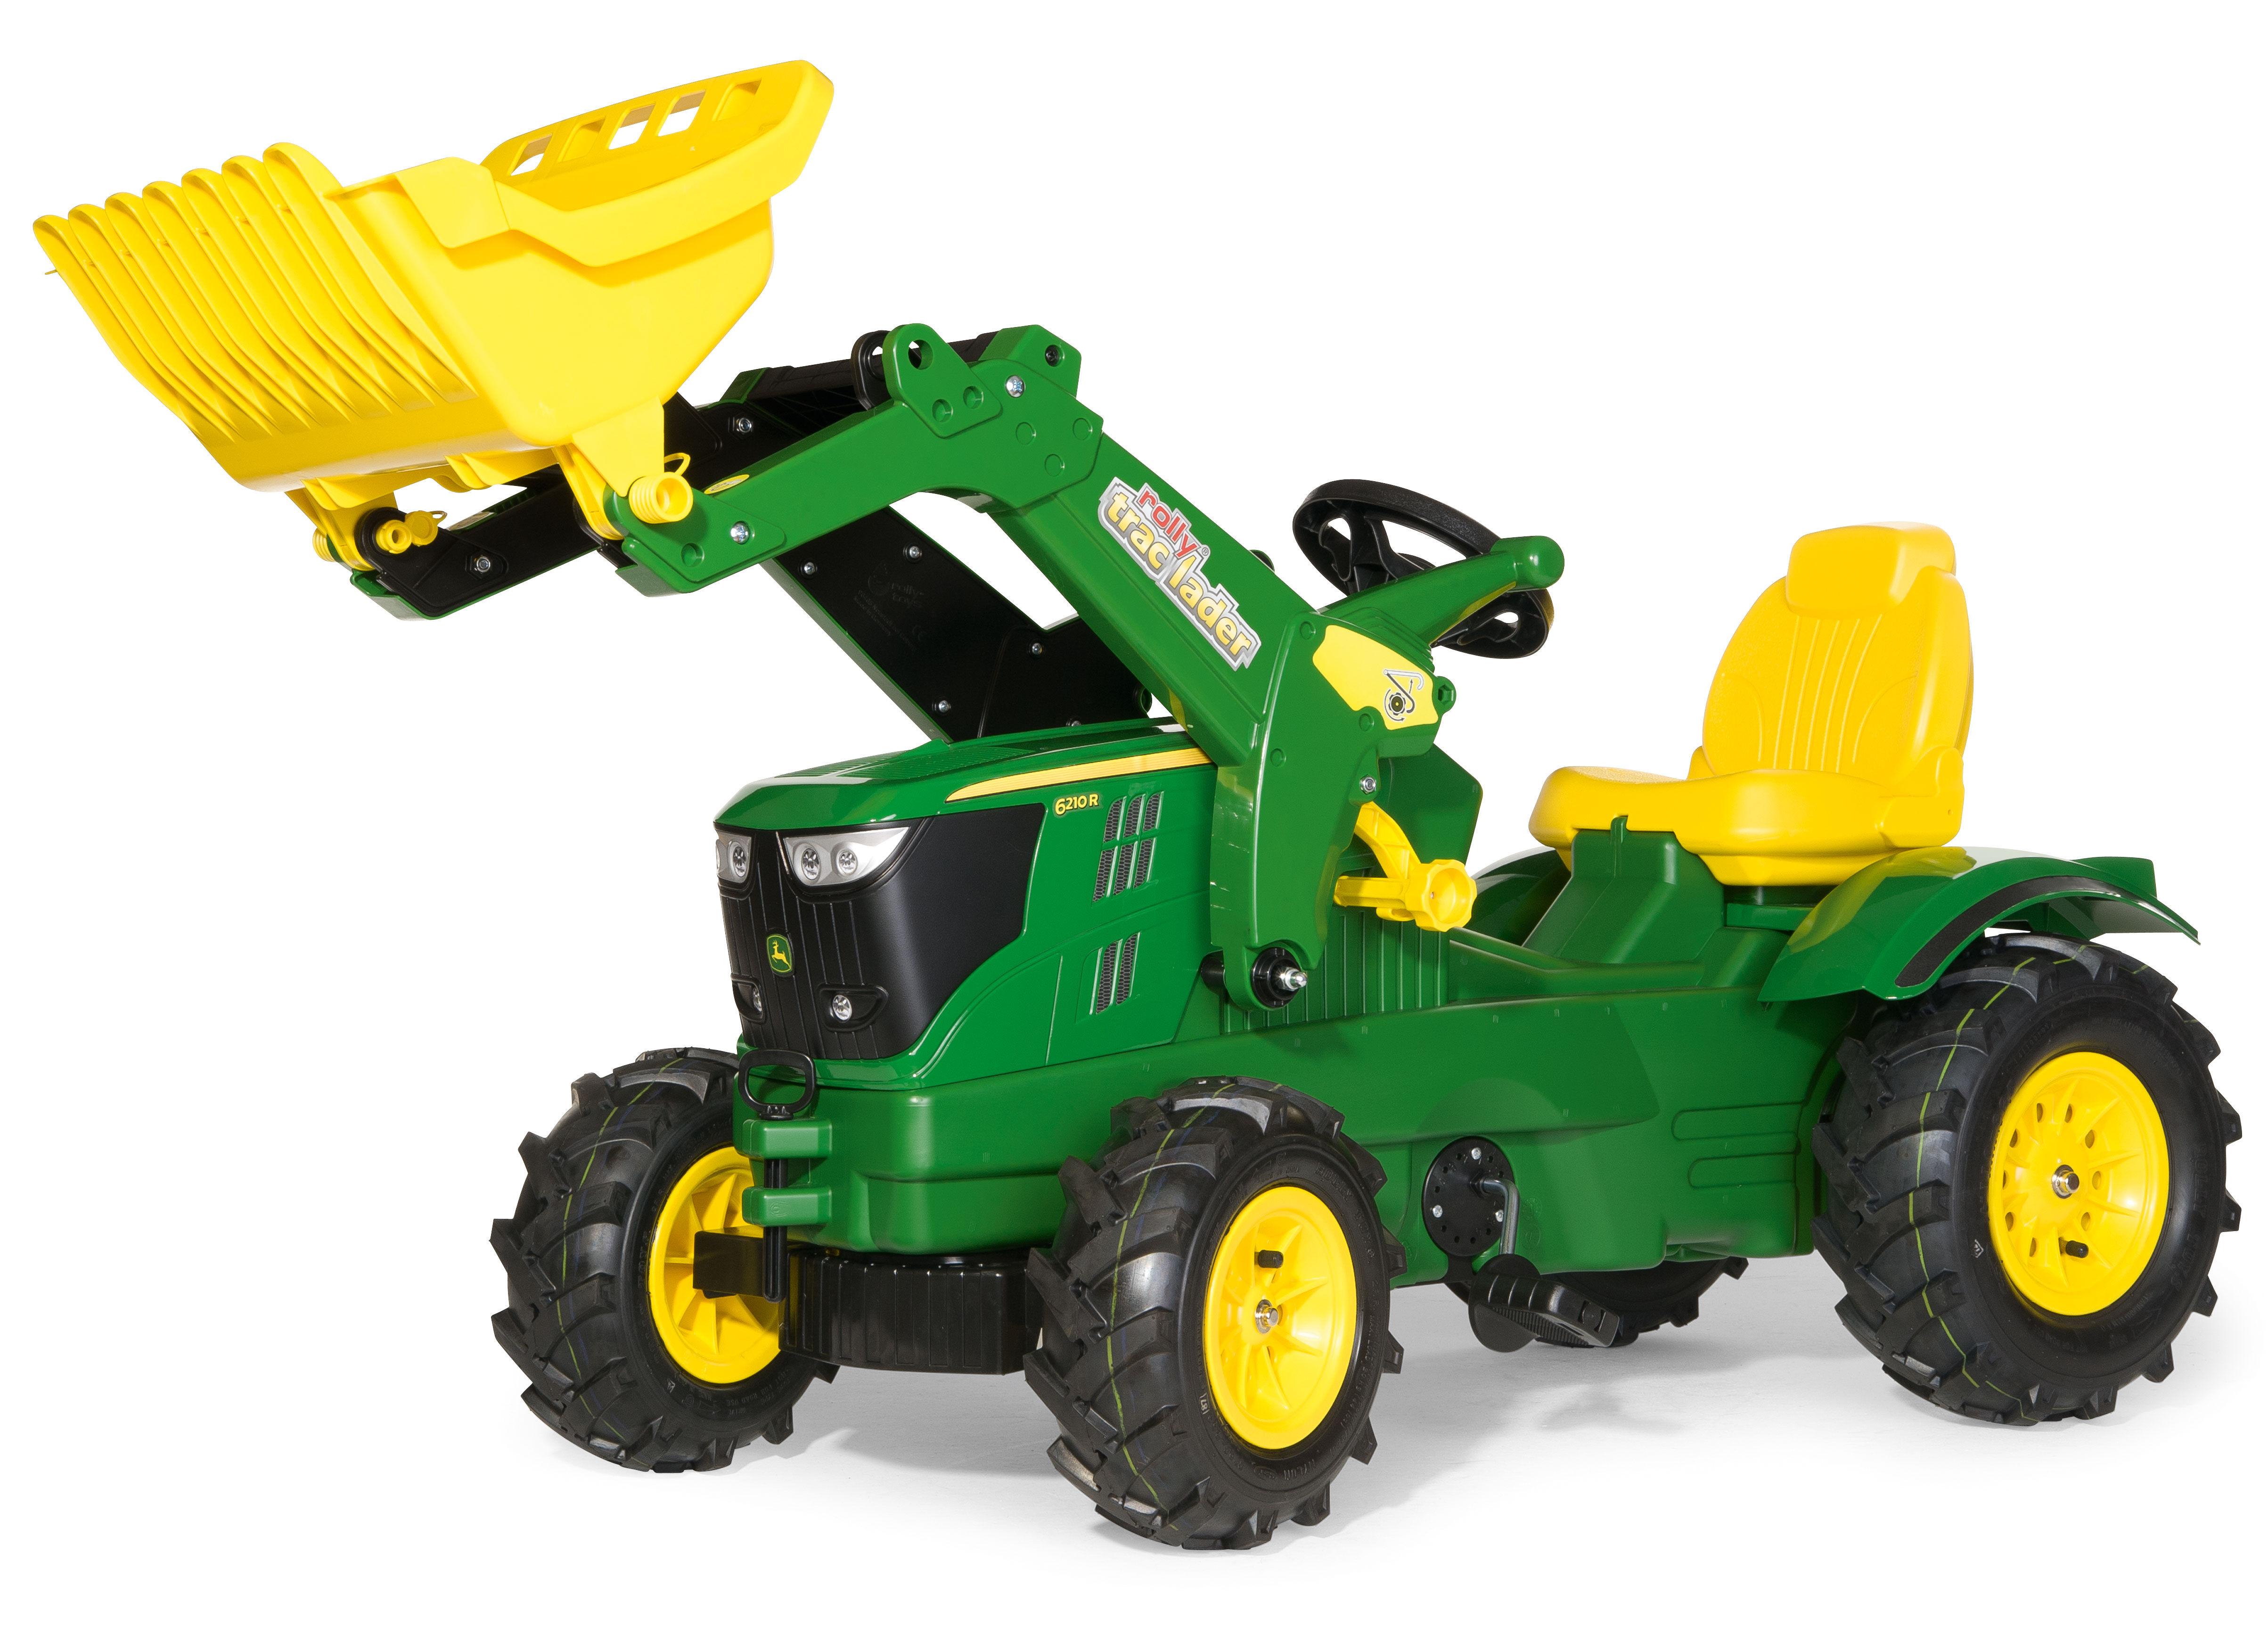 Rolly Toys Rolly Farmtrack John Deere 6210R tråtraktor med lesseapparat og luftfylte gummihjul